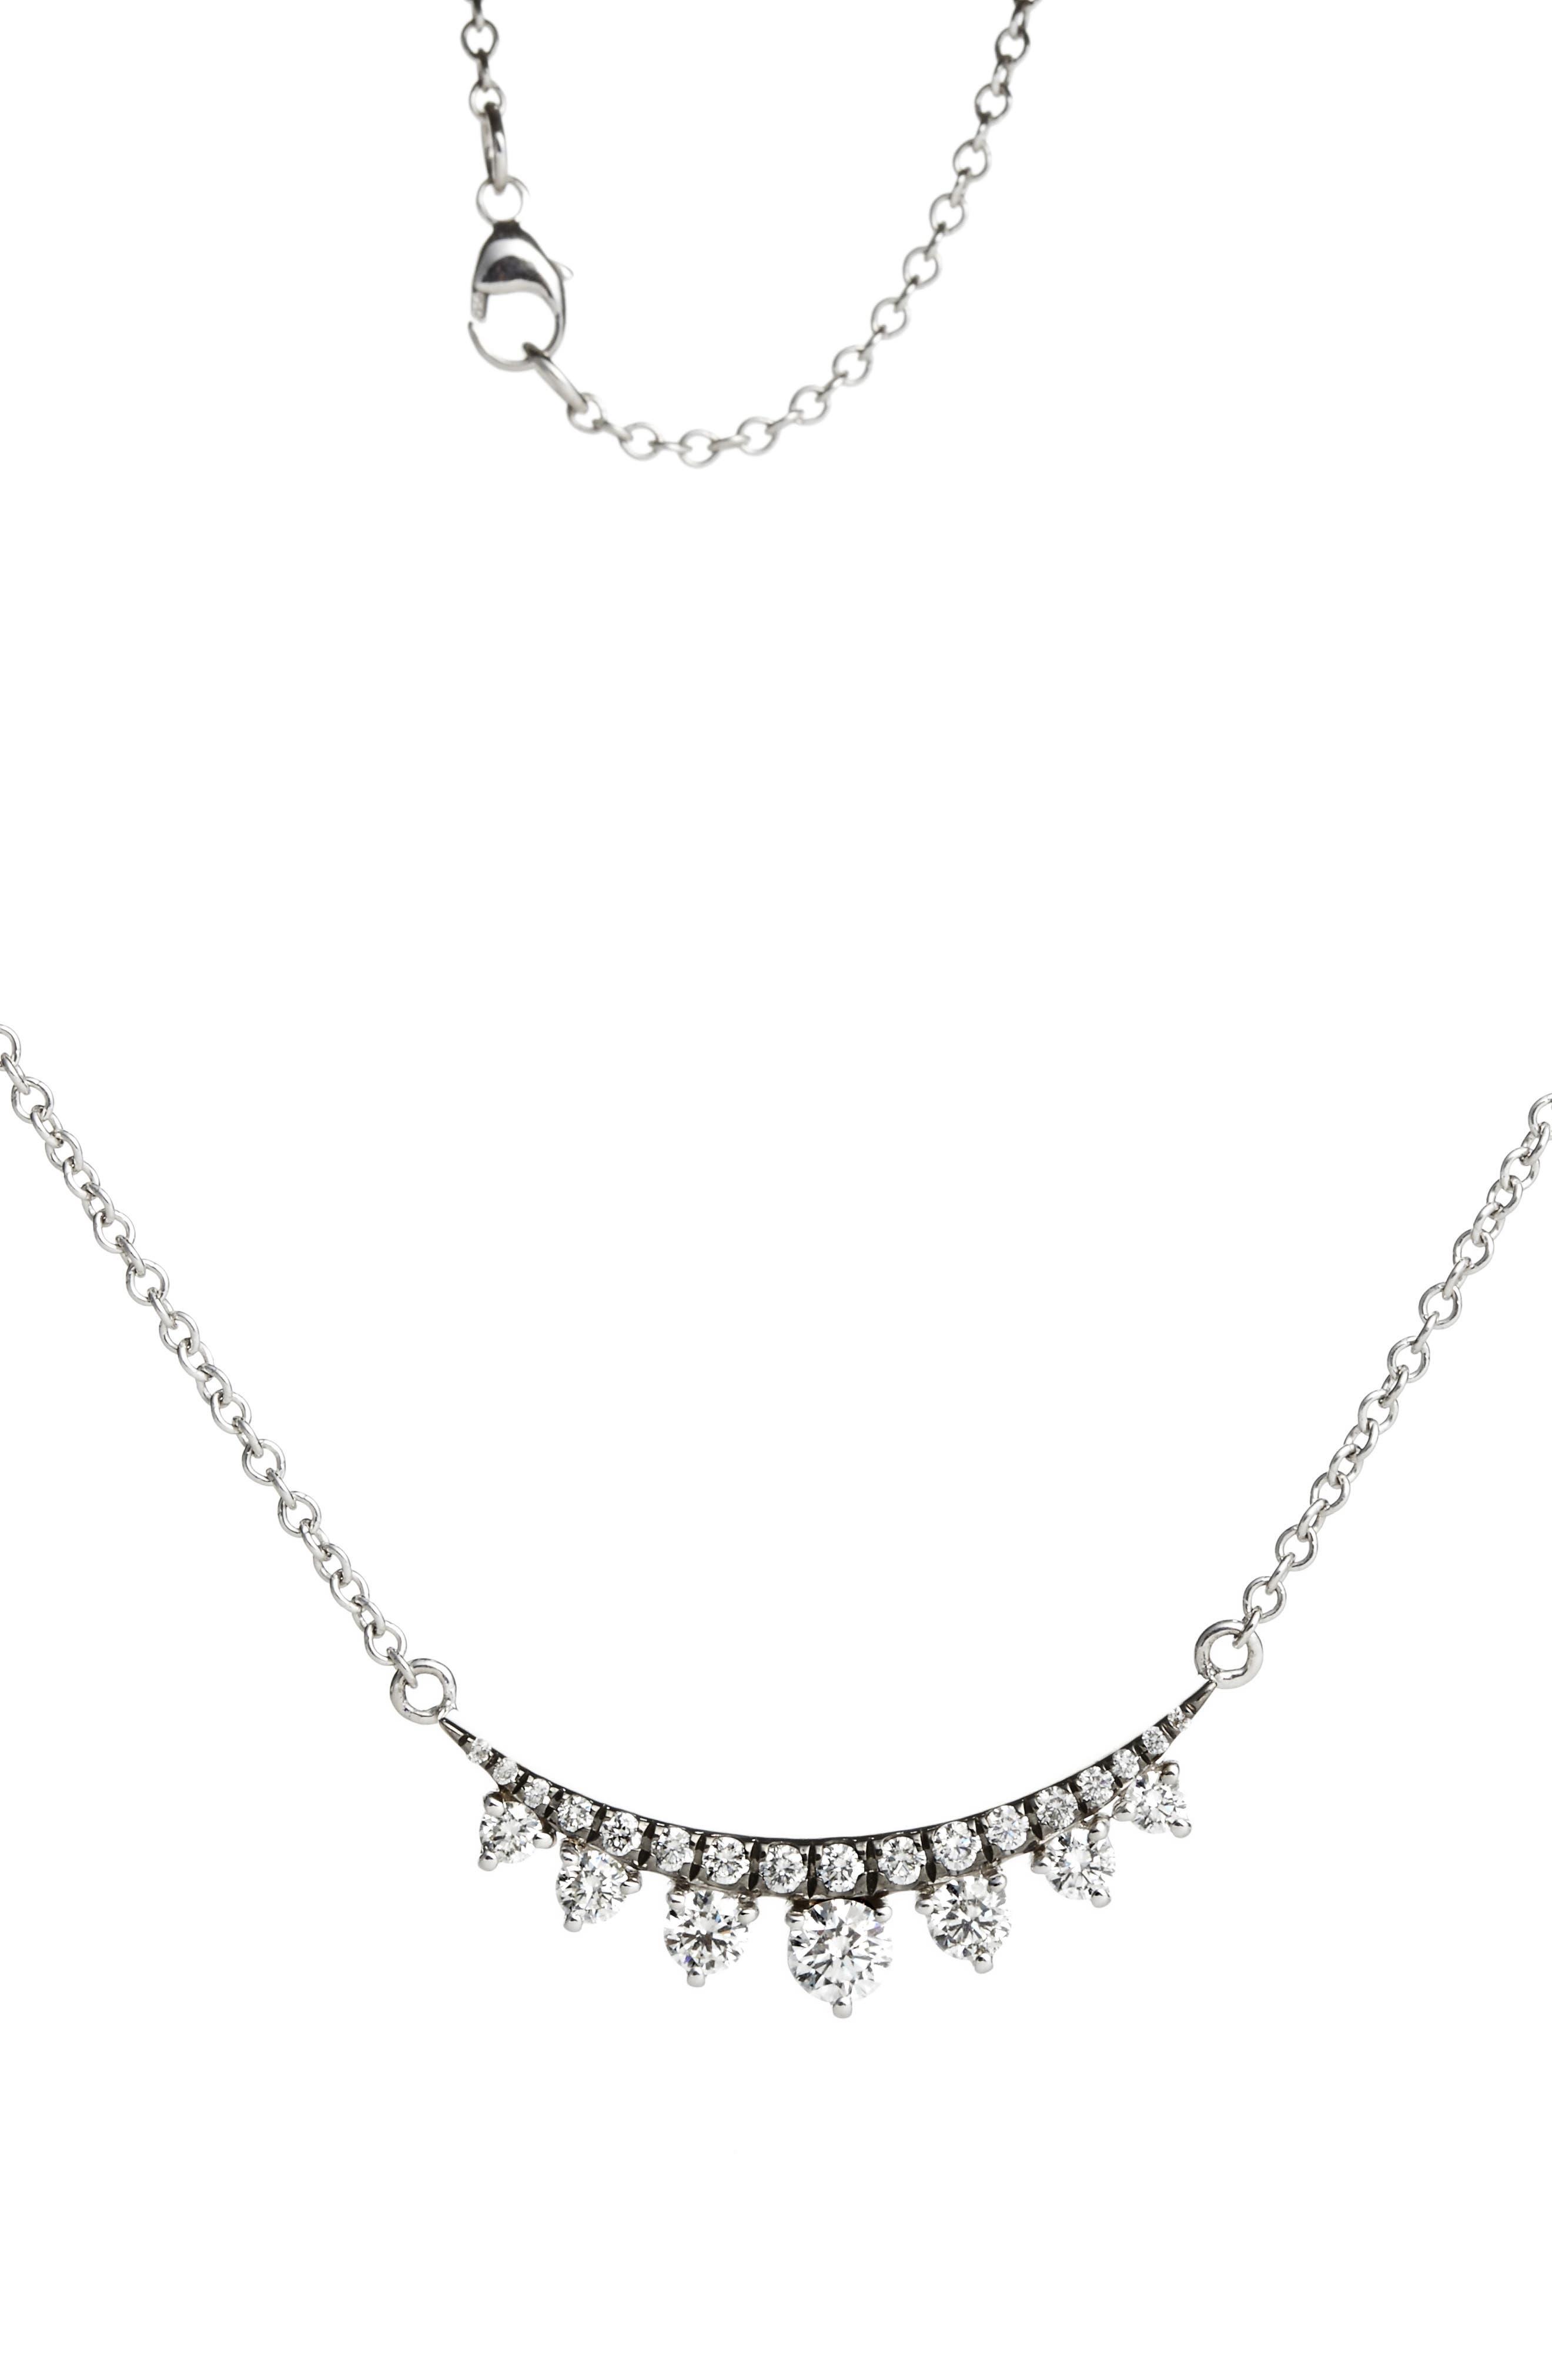 Prive Luxe 18K White Gold & Diamond Necklace,                             Main thumbnail 1, color,                             DIAMOND/BLACK RHODIUM